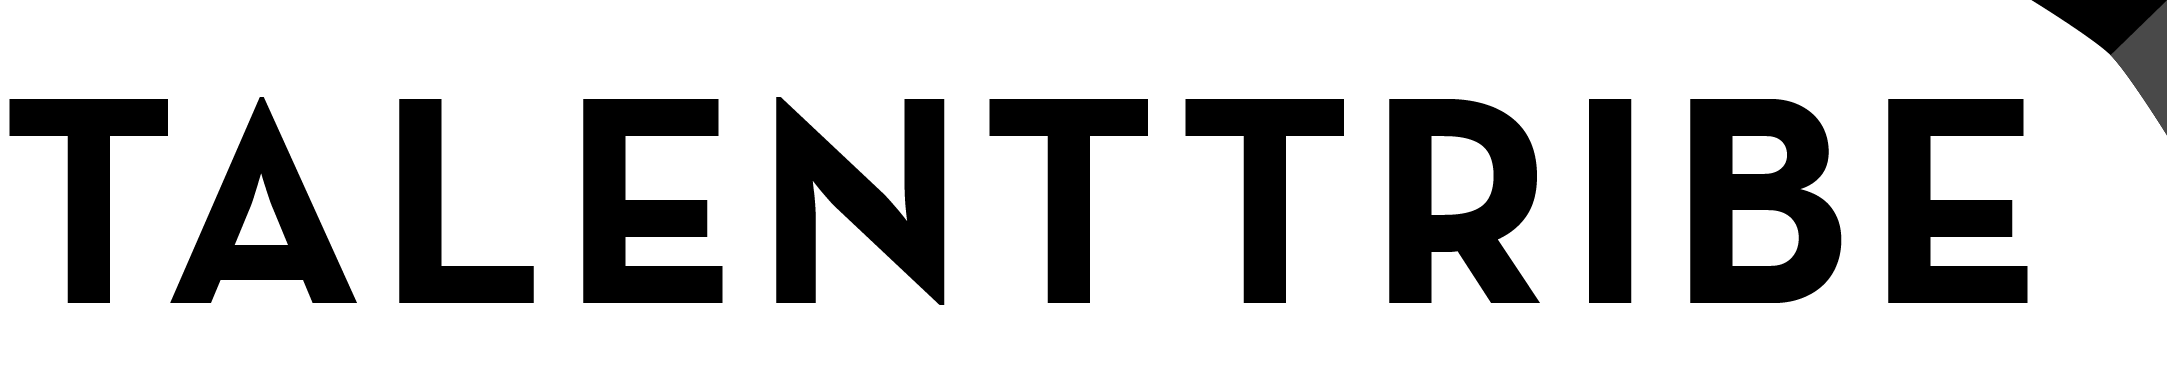 TalentTribe logo